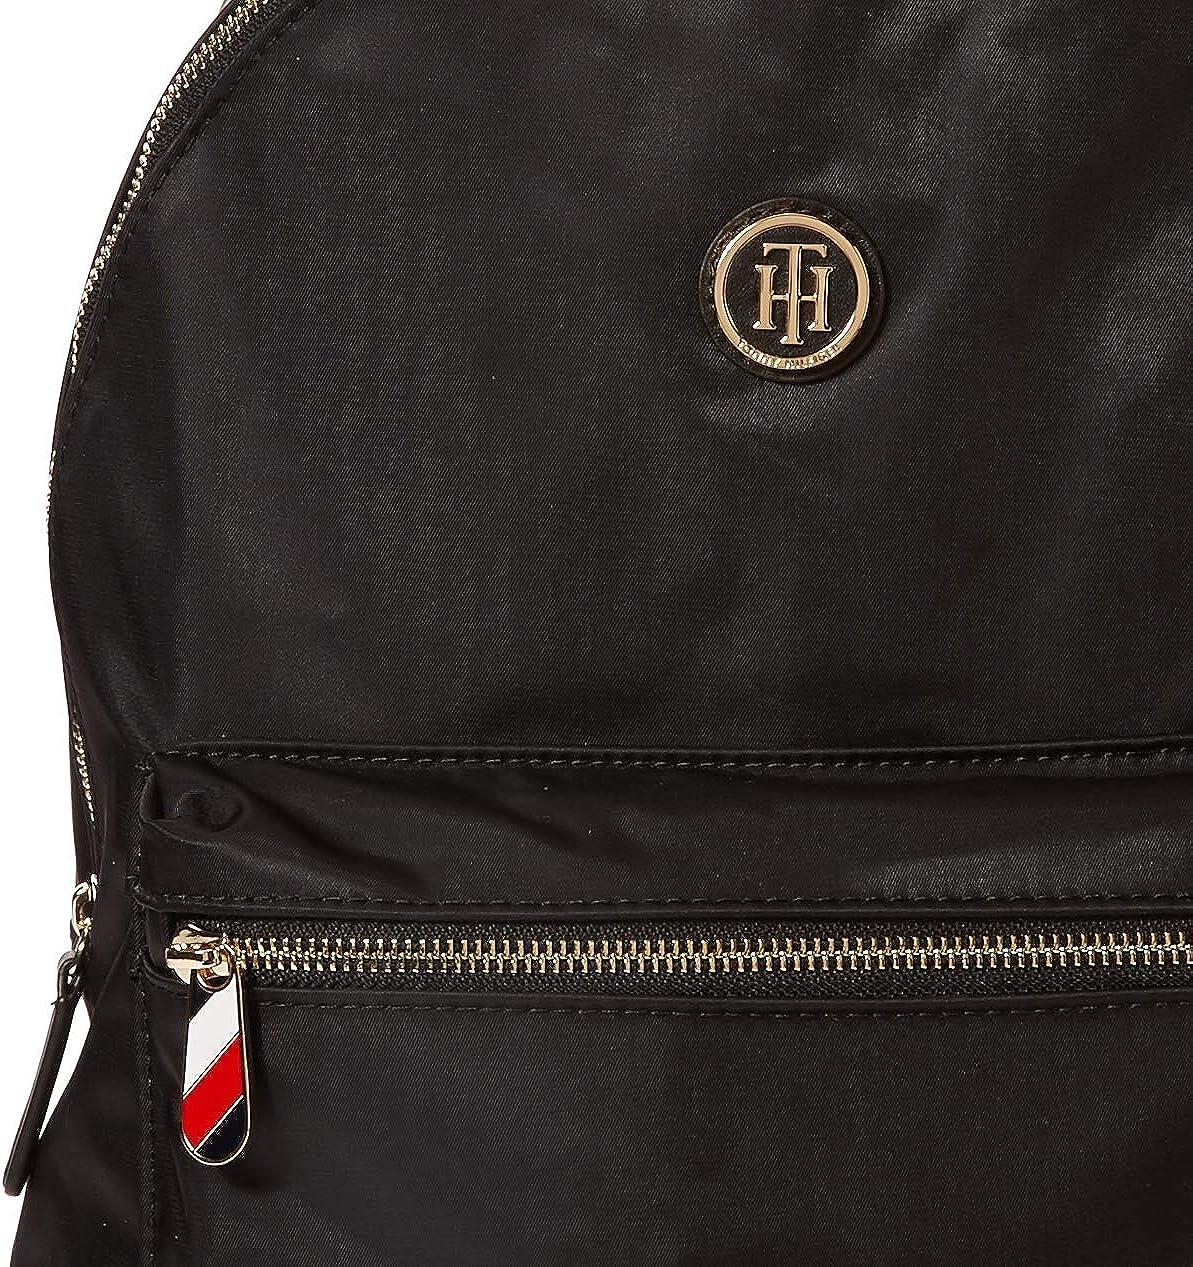 13x40x31 centimeters B x H x T SM POPPY BACKPACK Women/'s Cross-Body Bag Black